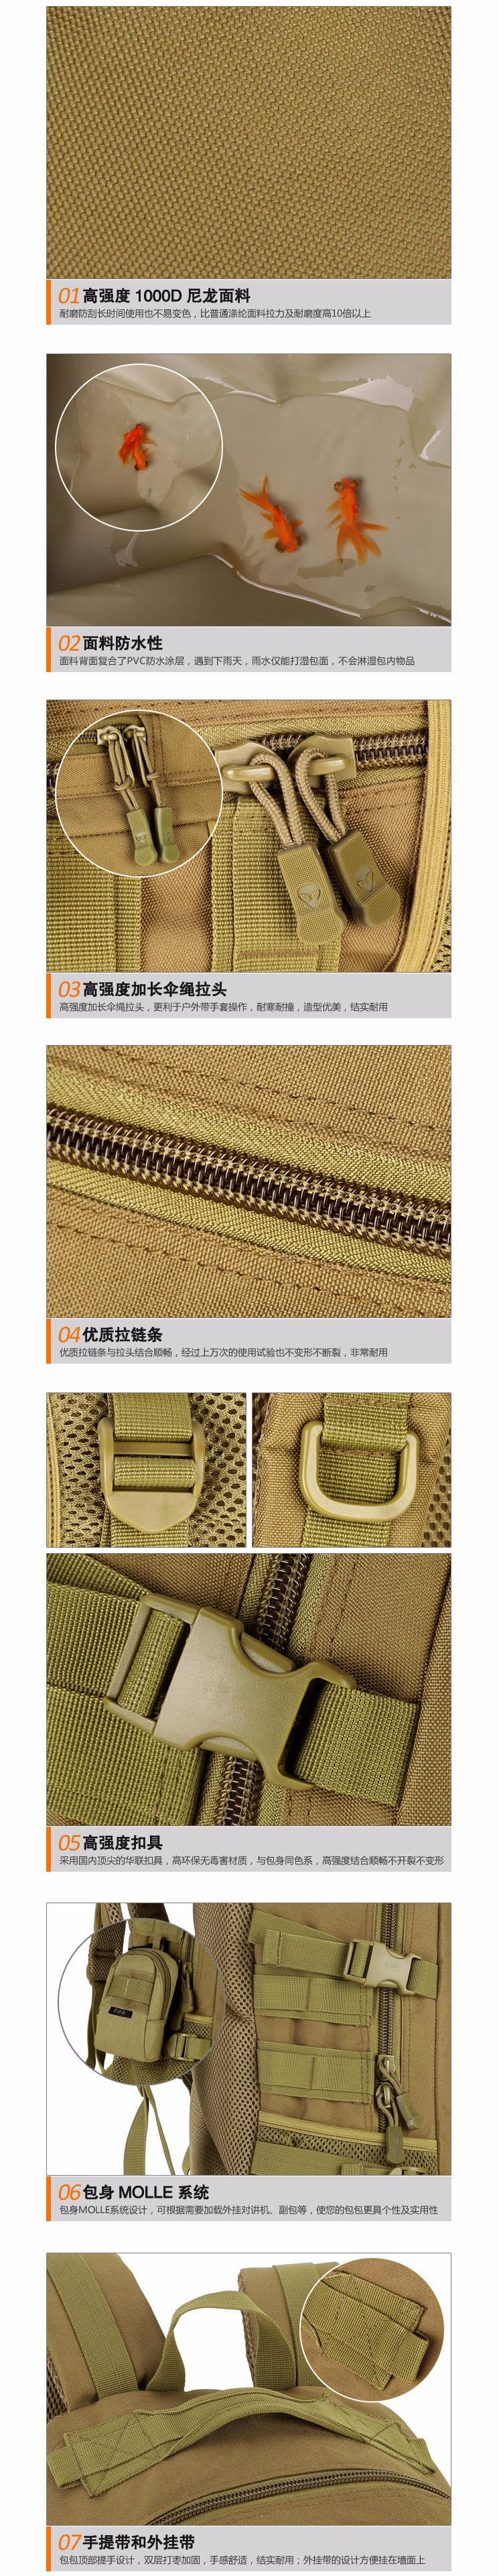 40L Waterproof Molle Backpacks Military 3P Tactics Rackpack Assault Nylon Travel Rucksack Bag for Men Women Rucksack Bag 9